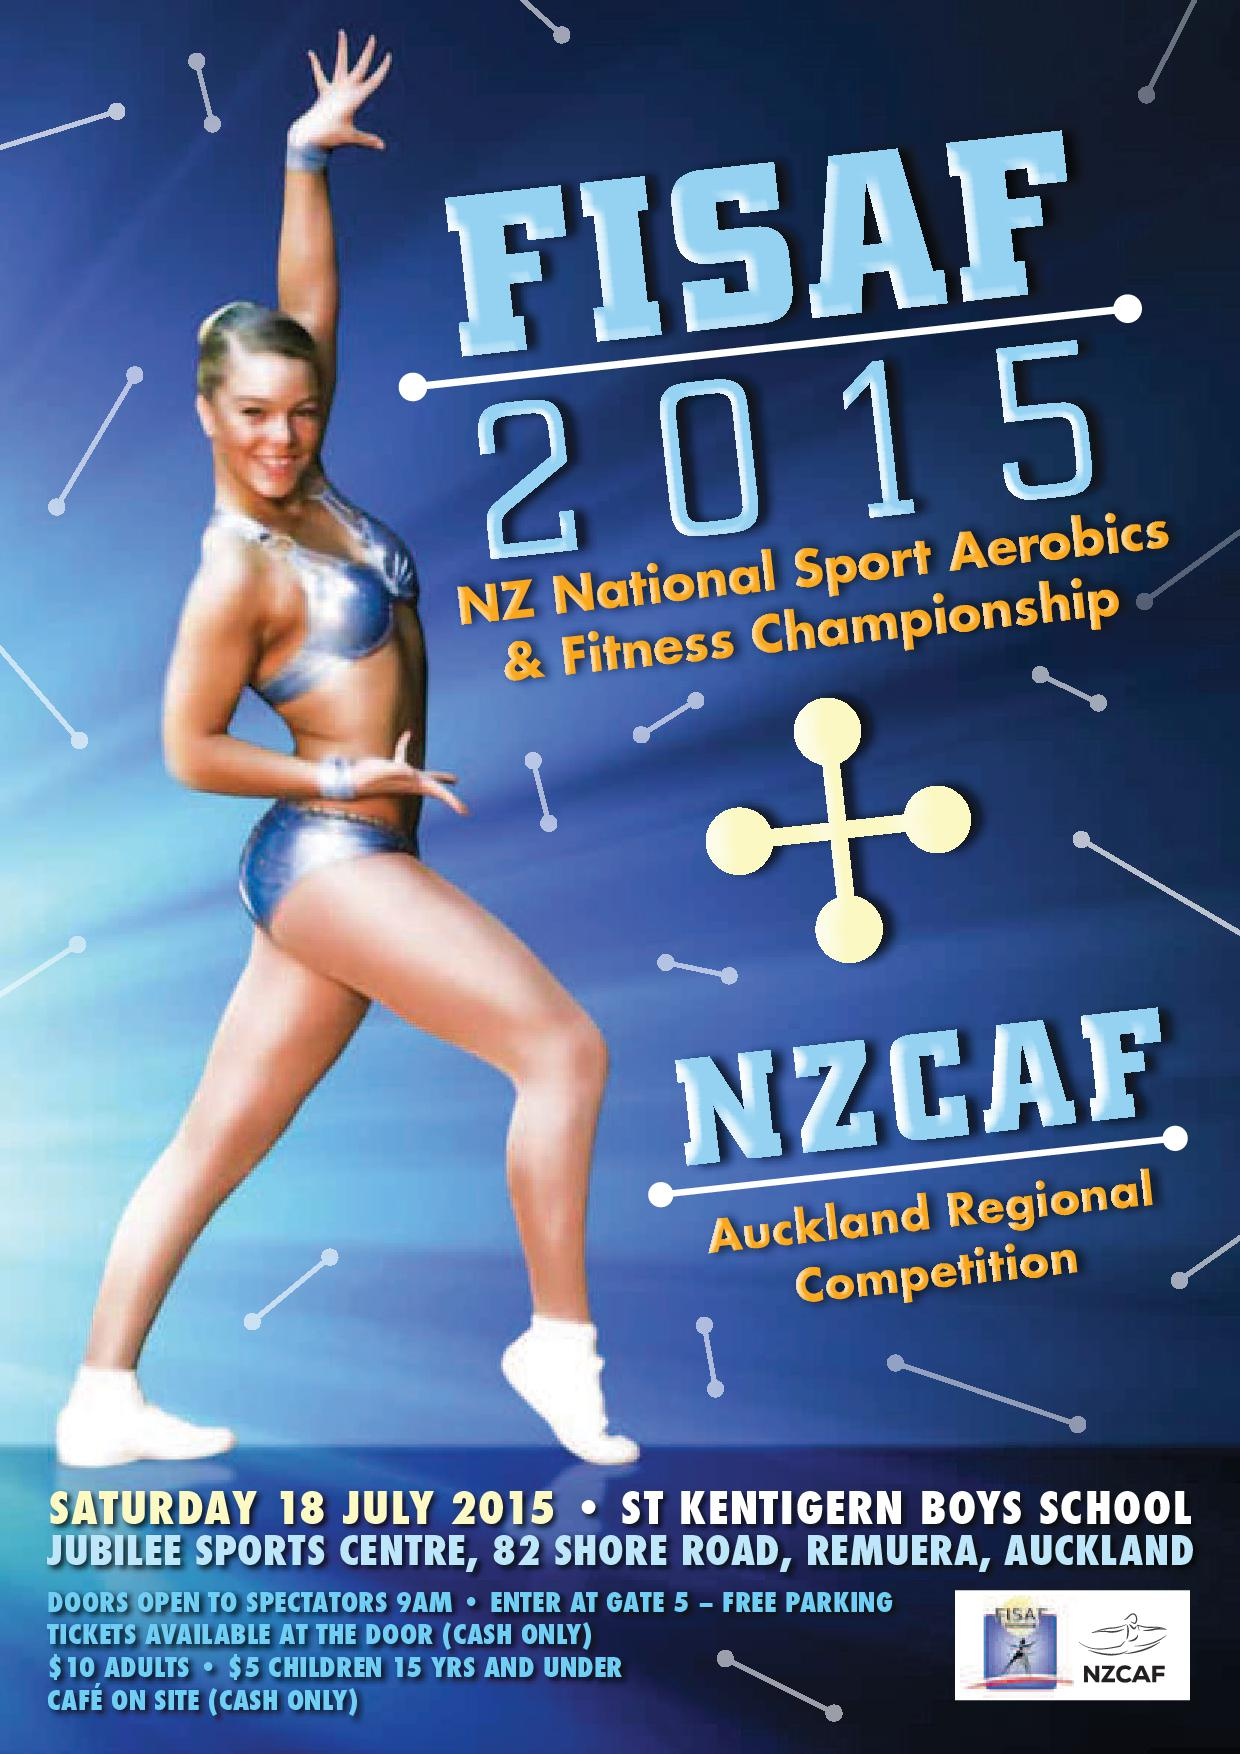 FISAF 2015